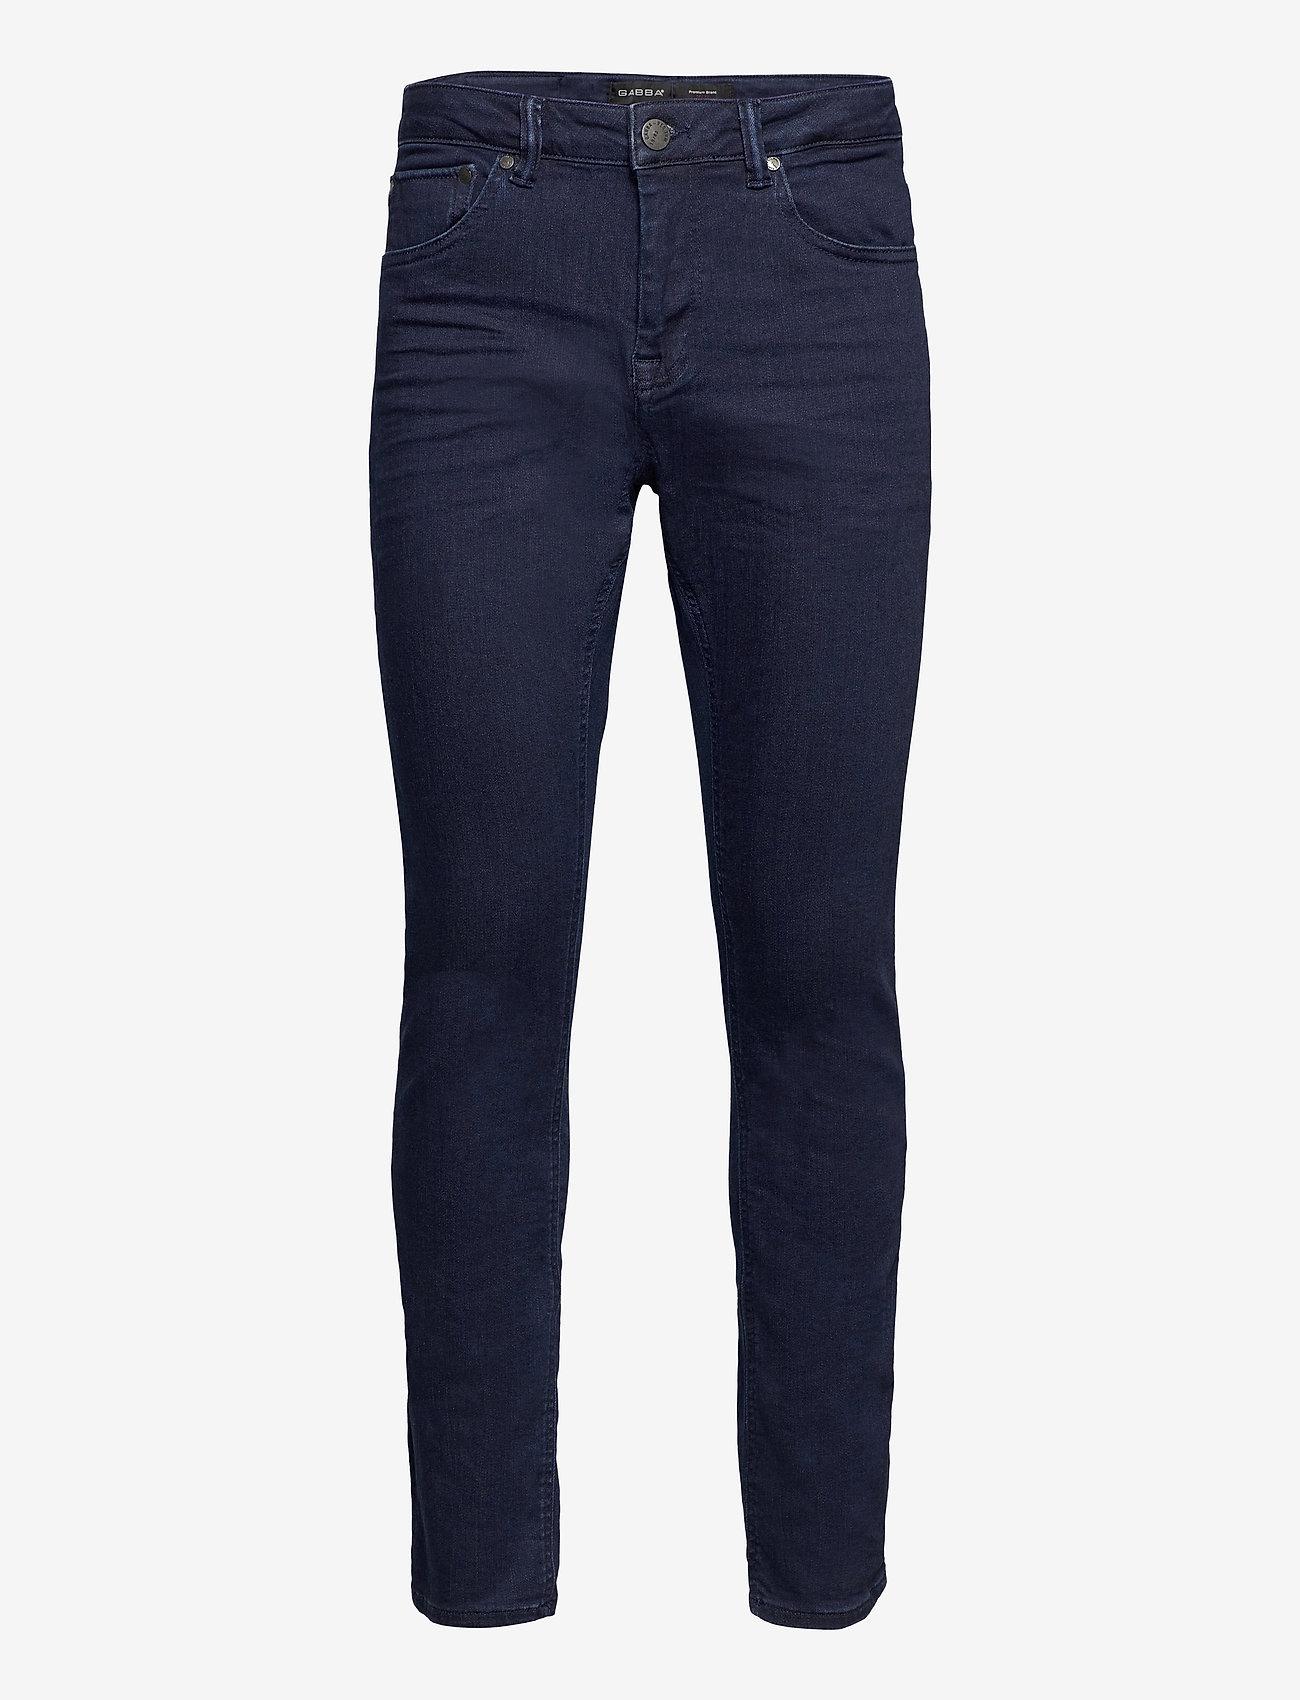 Gabba - Jones K3869 Jeans - slim jeans - rs1344 - 0